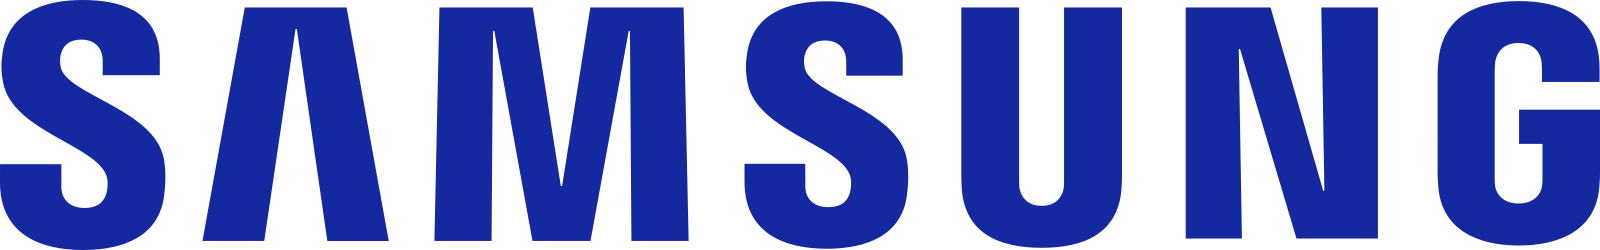 samsung logo 4 1 - Samsung Logo